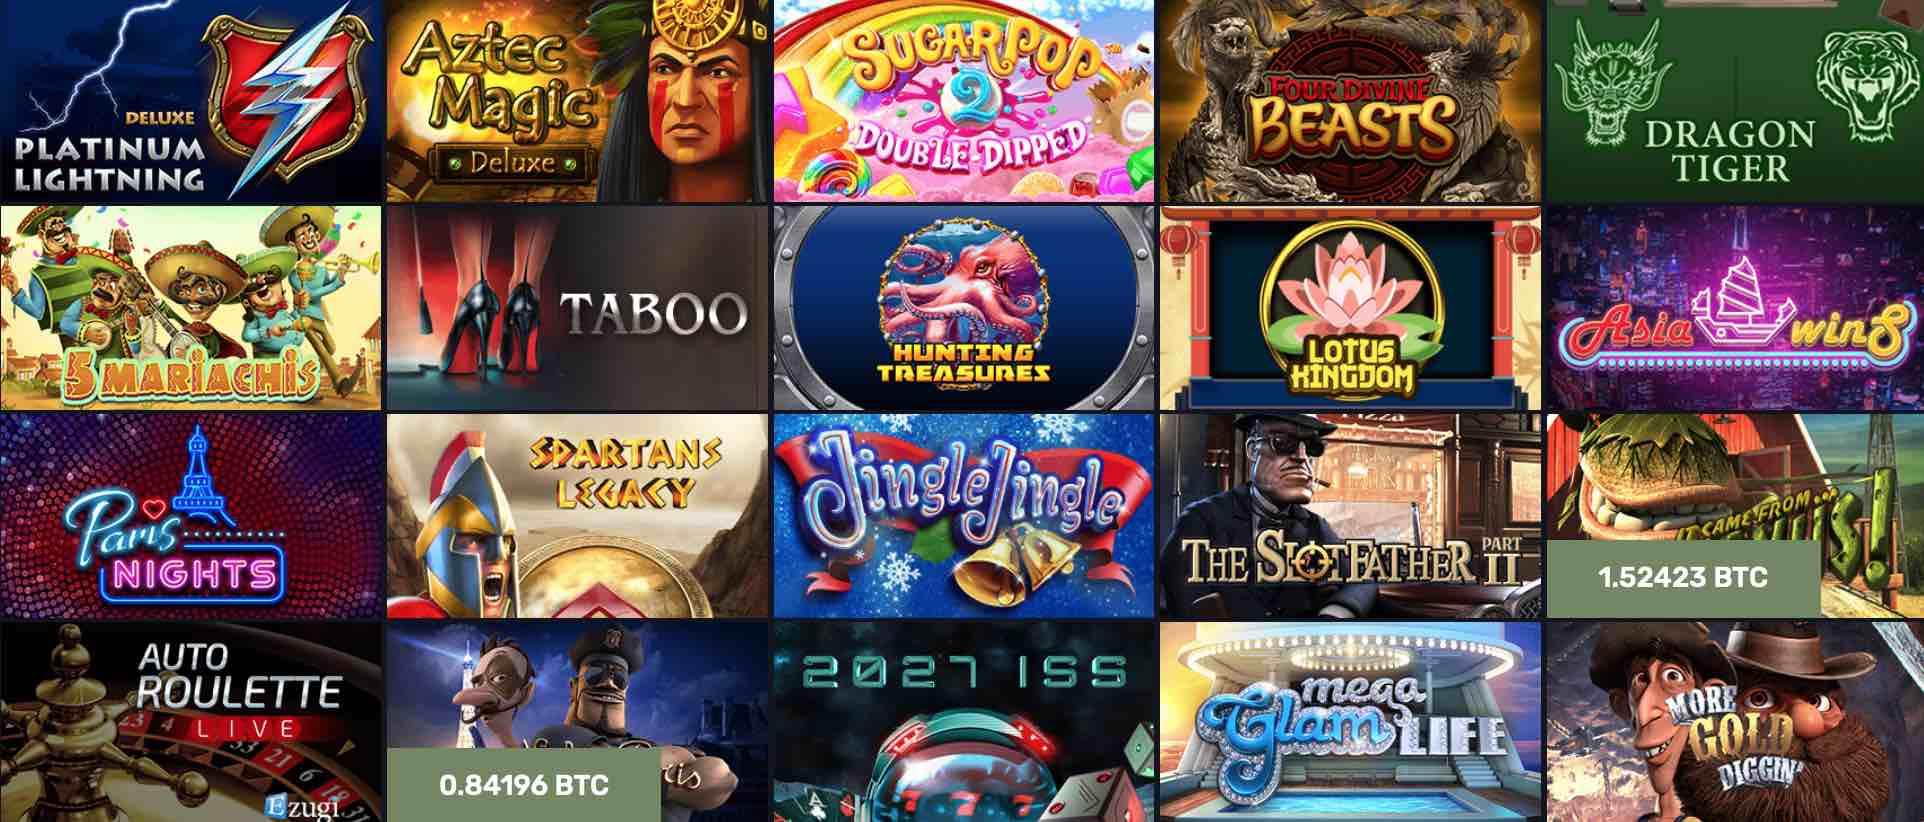 Online bitcoin roulette prediction software